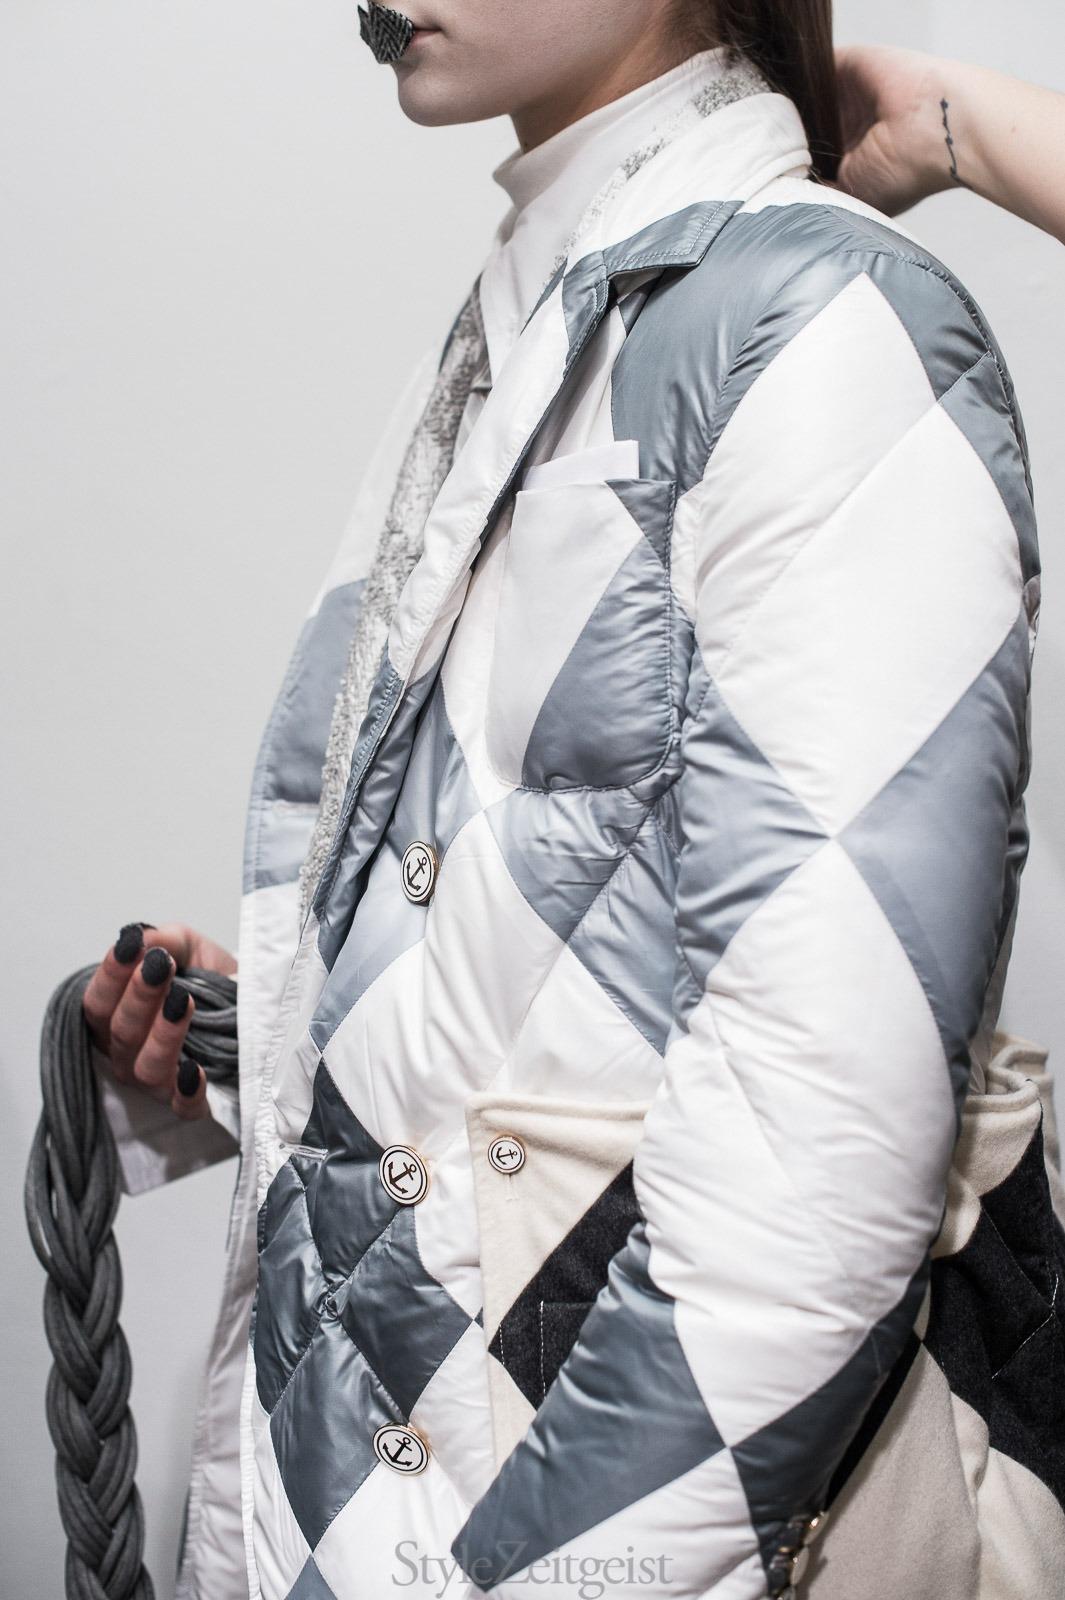 Thom Browne F/W17 Women's - New York Backstage - fashion - Thome Browne, StyleZeitgeist, NYFW, New York, FW17, Fashion, Fall Winter, Backstage, 2017